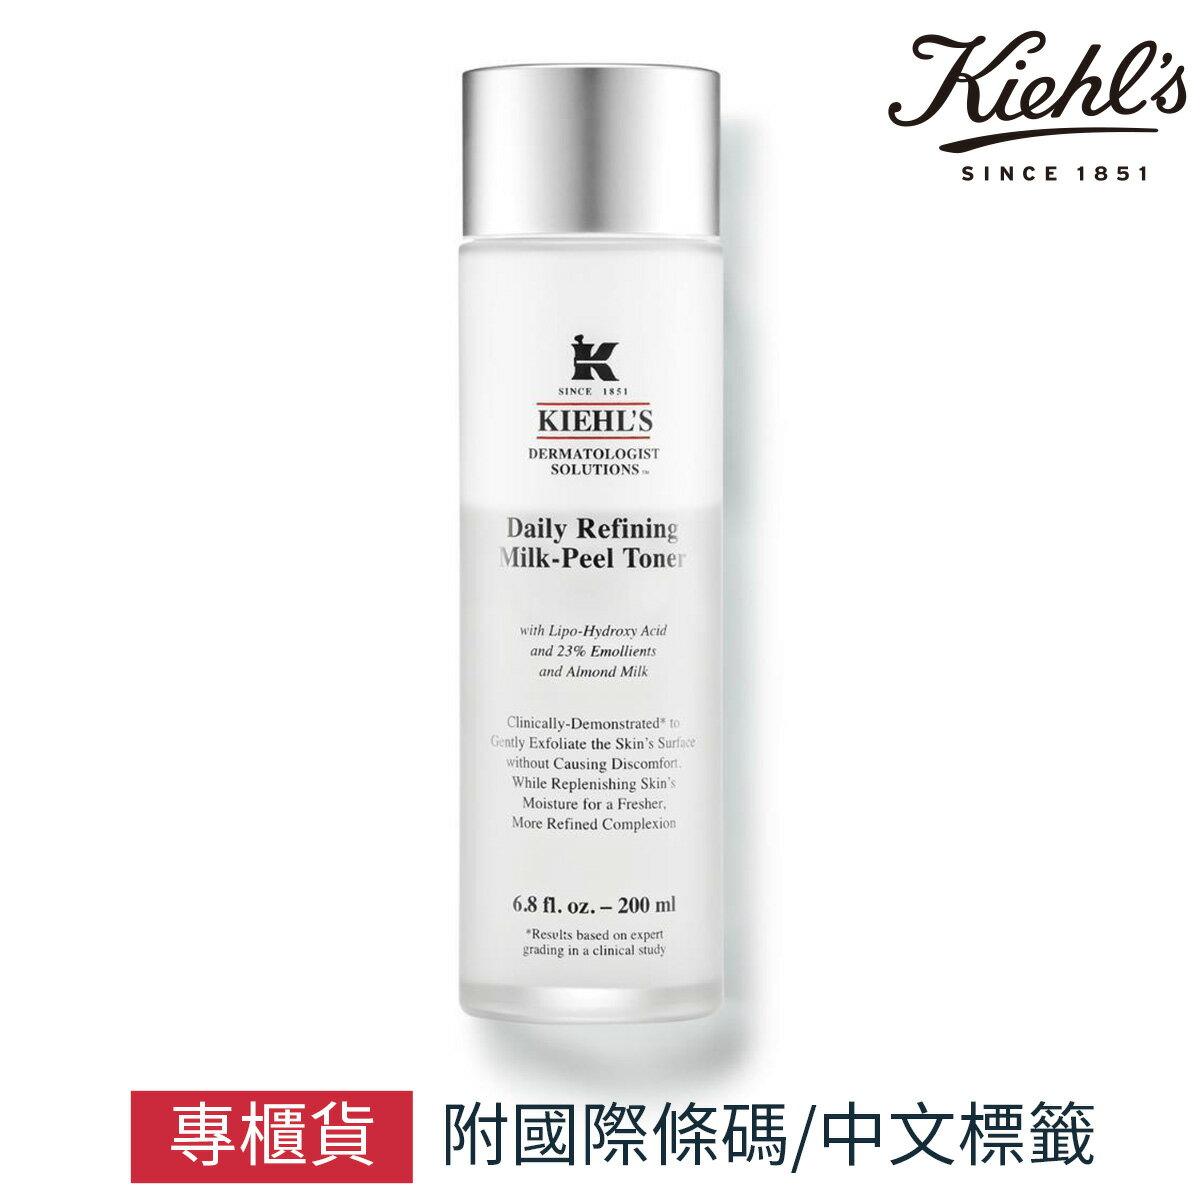 Kiehl's 契爾氏牛奶淨膚濃縮活膚露 200ml 專櫃公司貨 牛奶水【SP嚴選家】 0